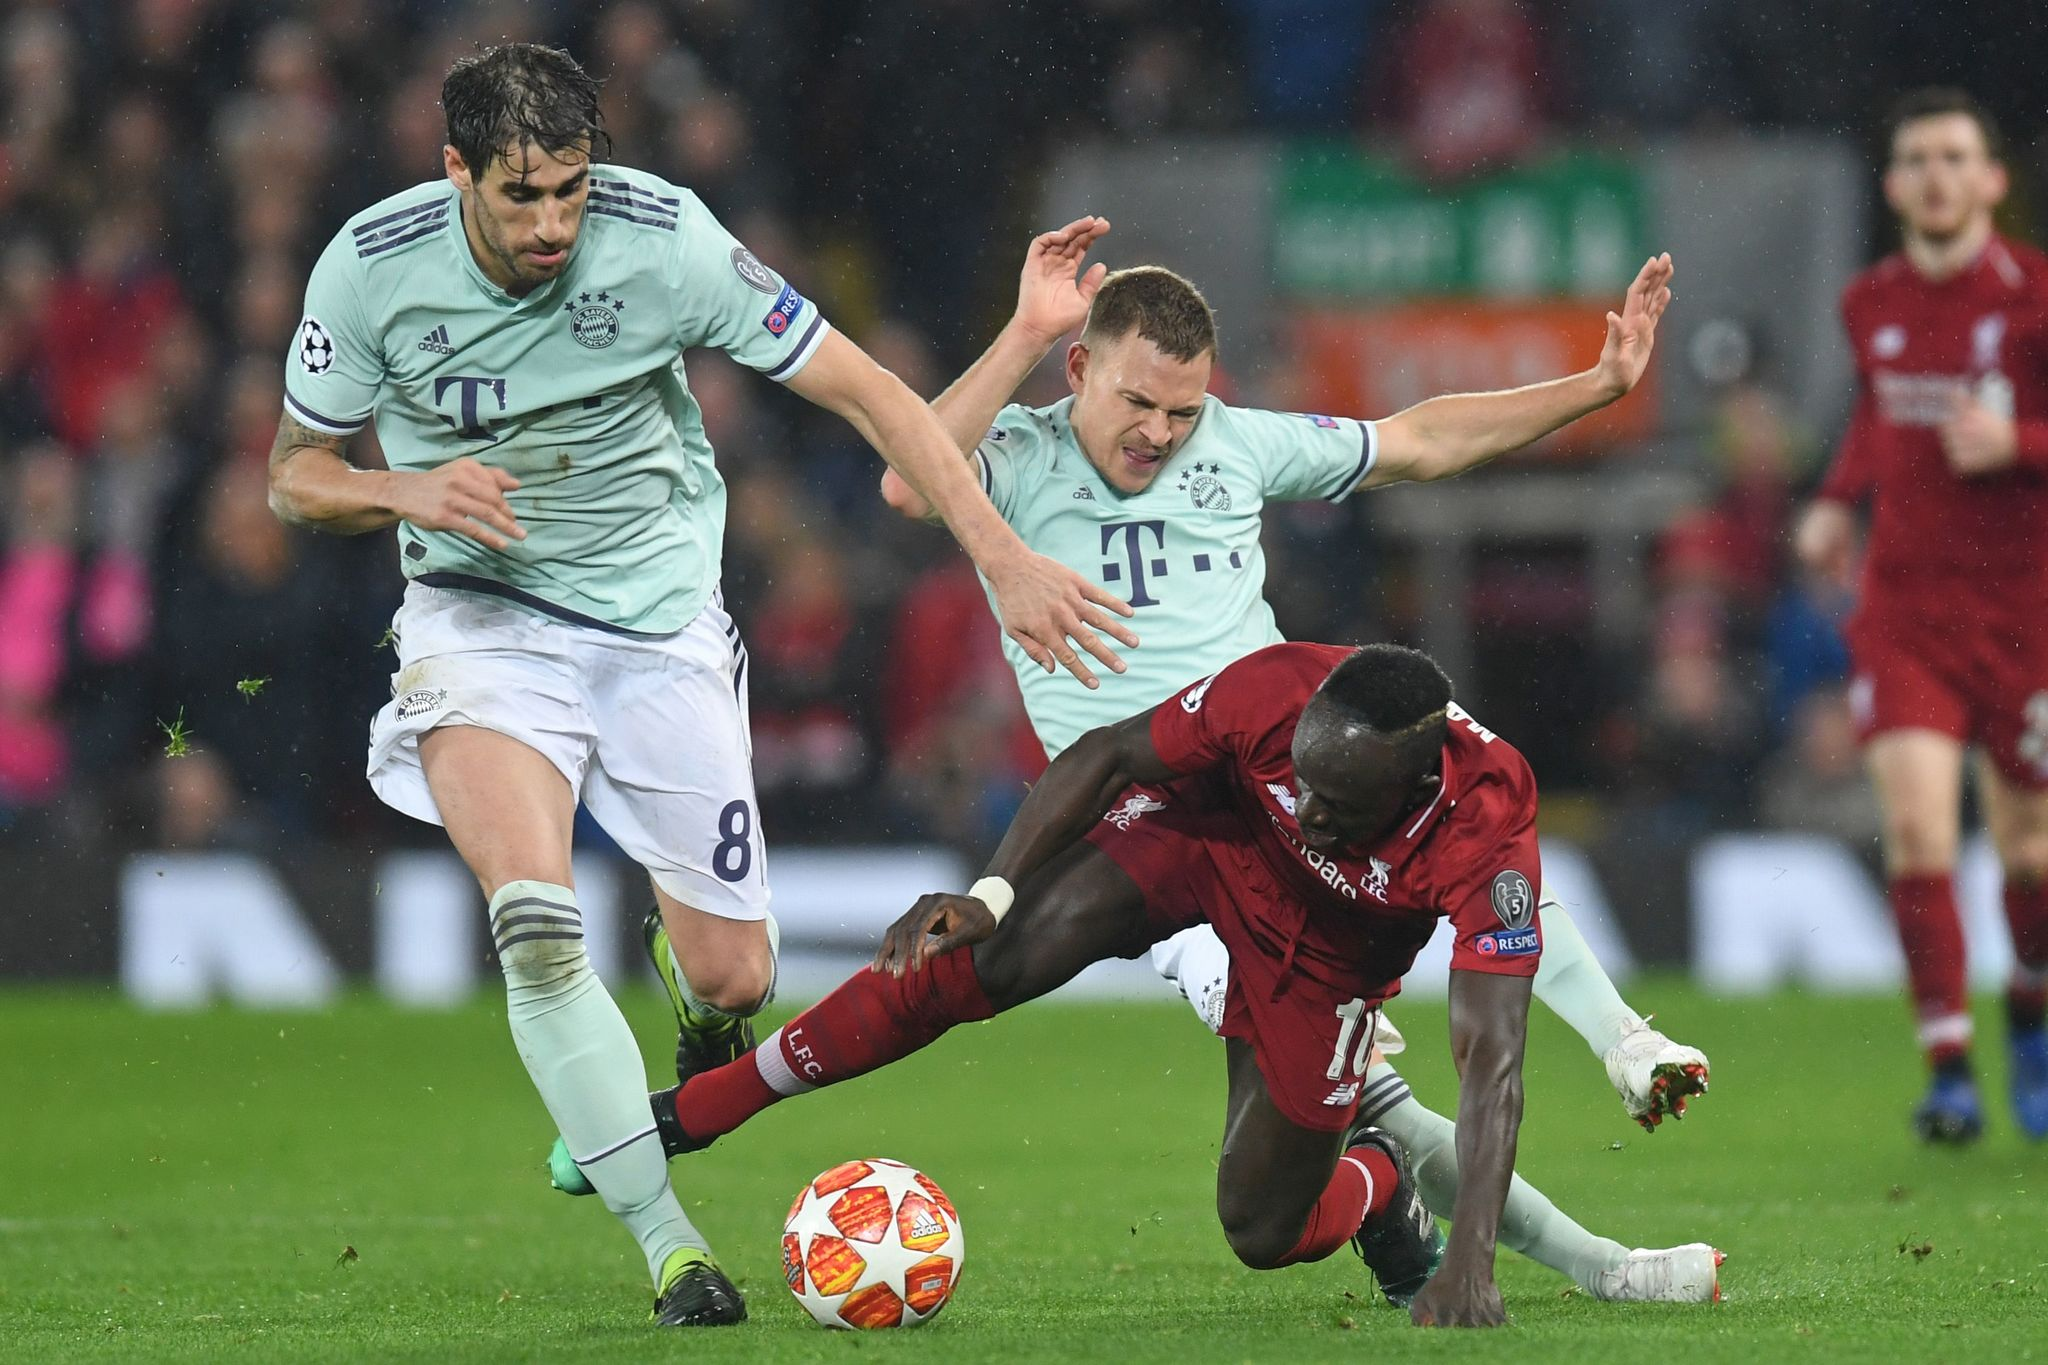 Bayern Vs Liverpool Photo: Liverpool Vs Bayern Múnich Liverpool Y Bayern Empatan En